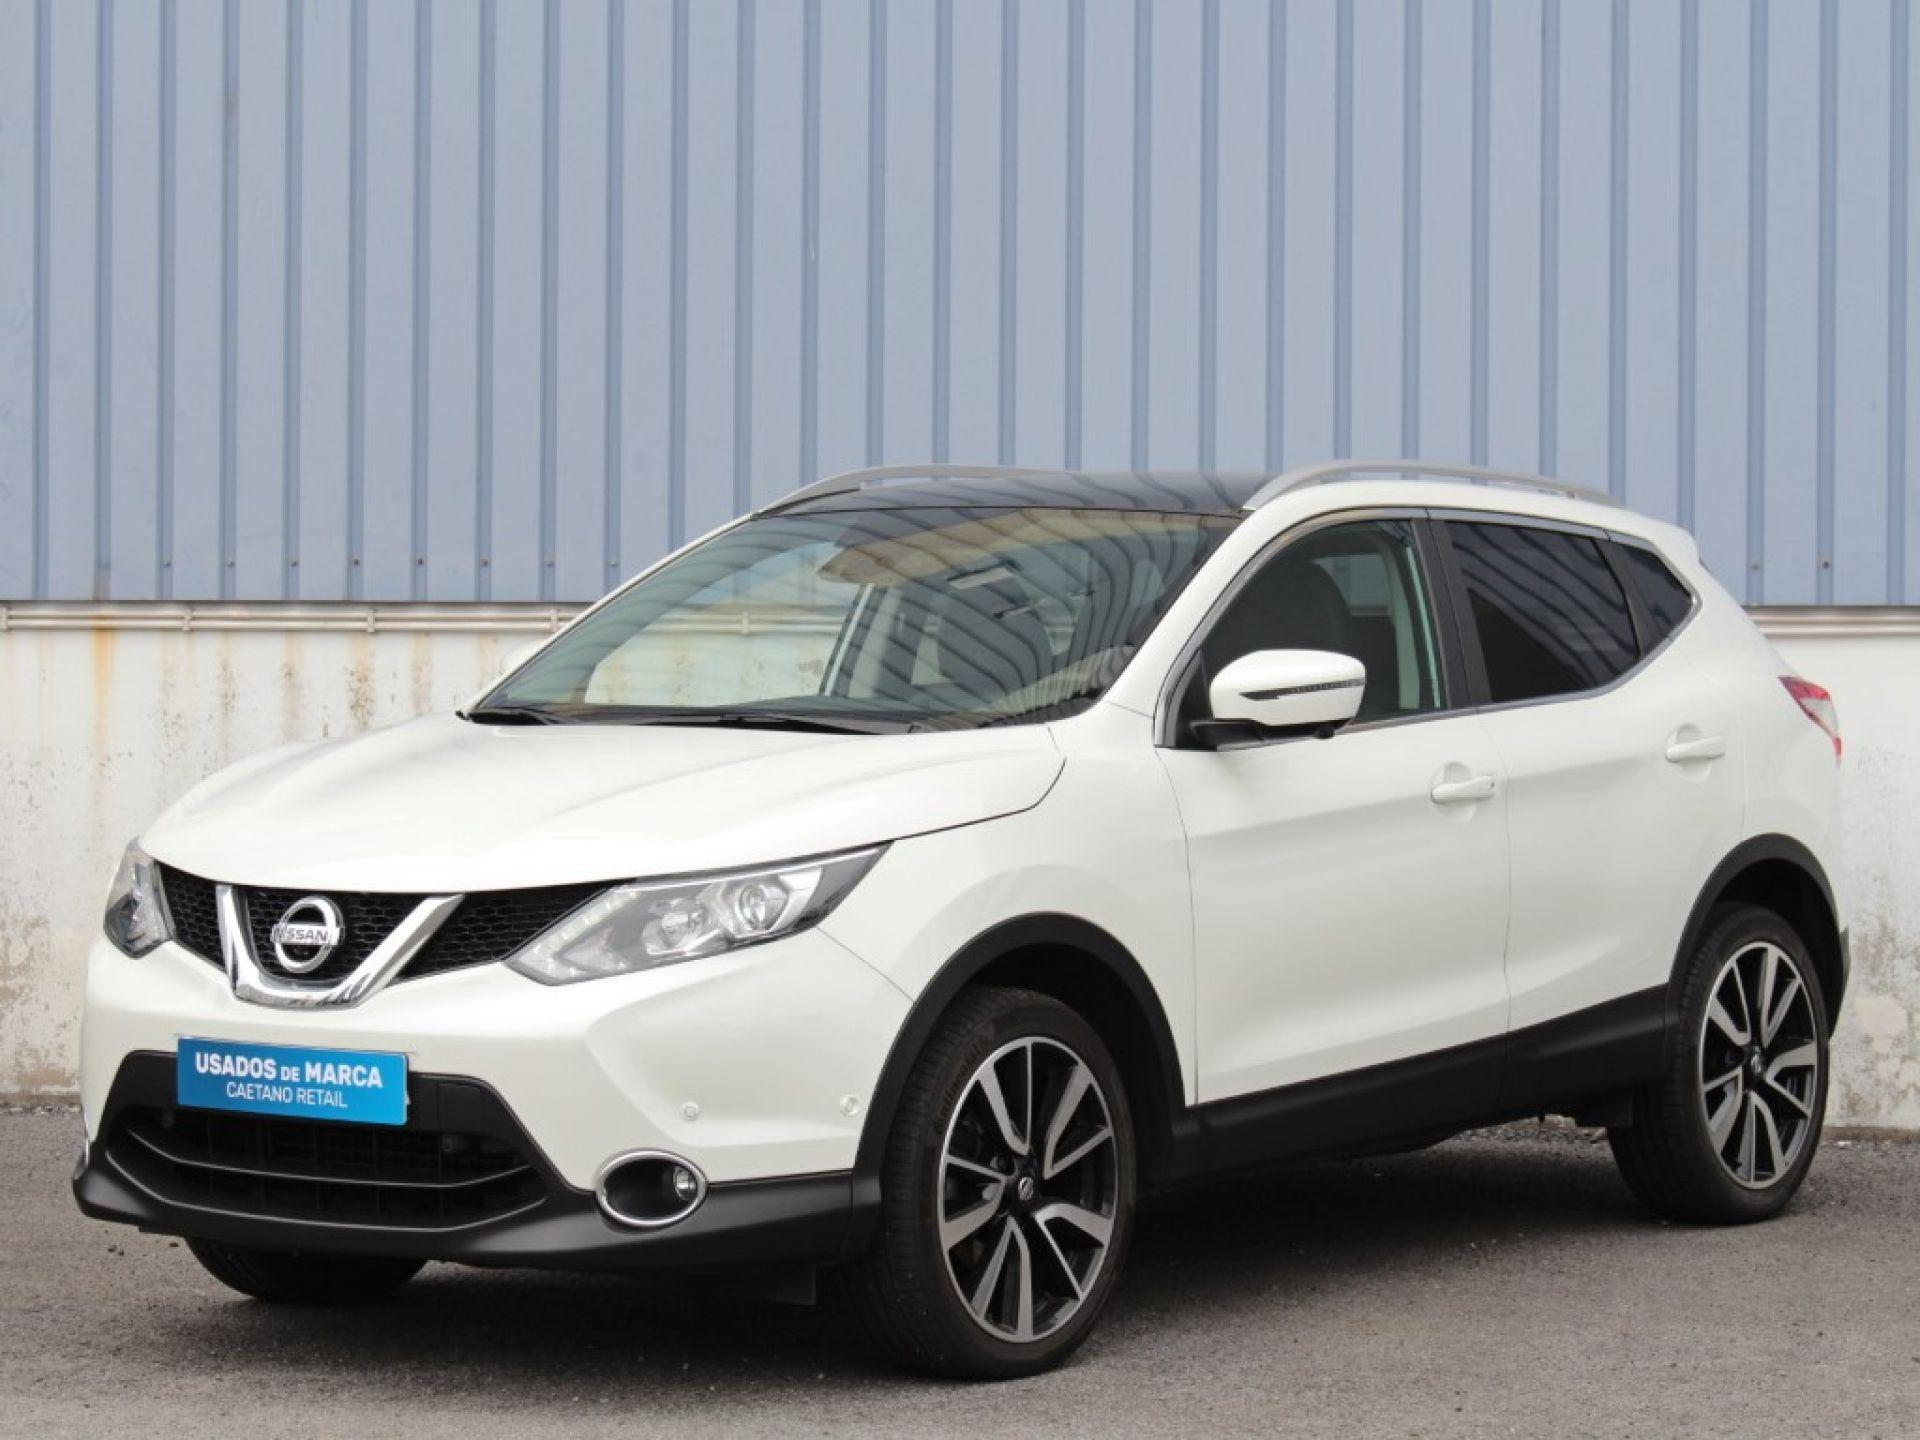 Nissan Qashqai 1.6 dCi 130cv Tekna Premium R segunda mão Porto